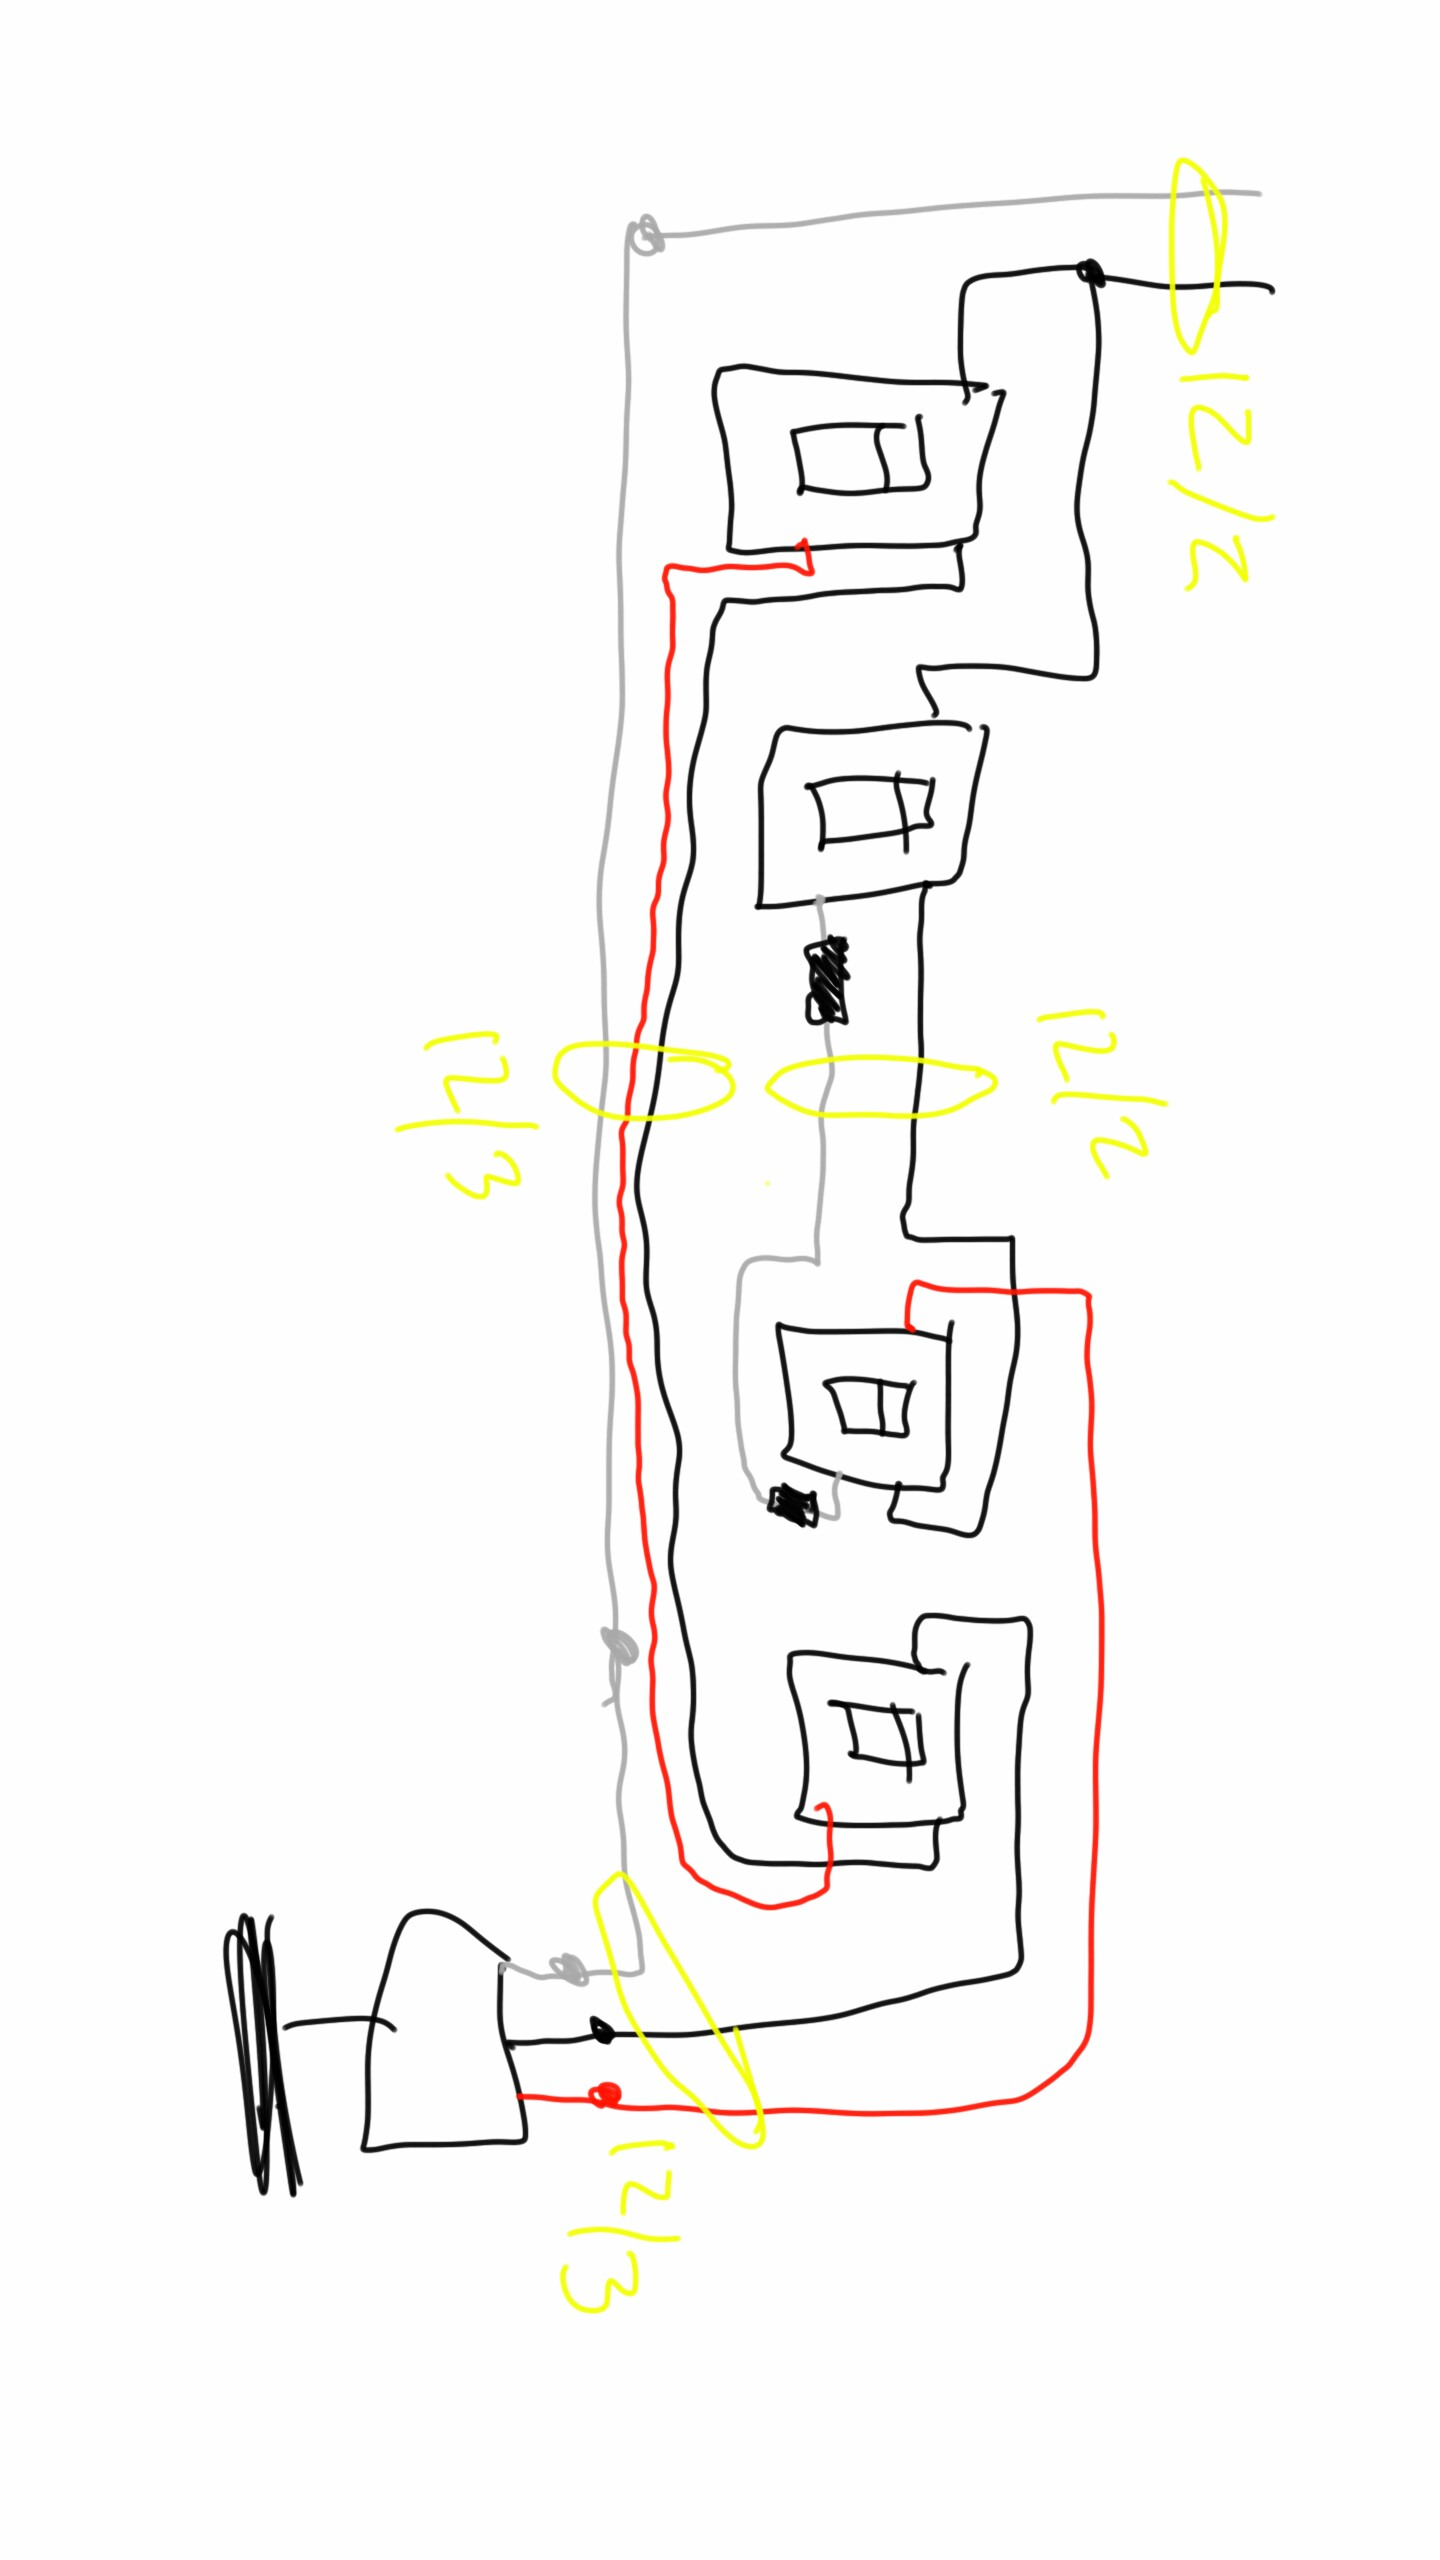 Enjoyable 2 Ways Switch Wiring Diagram Basic Electronics Wiring Diagram Wiring Cloud Onicaxeromohammedshrineorg